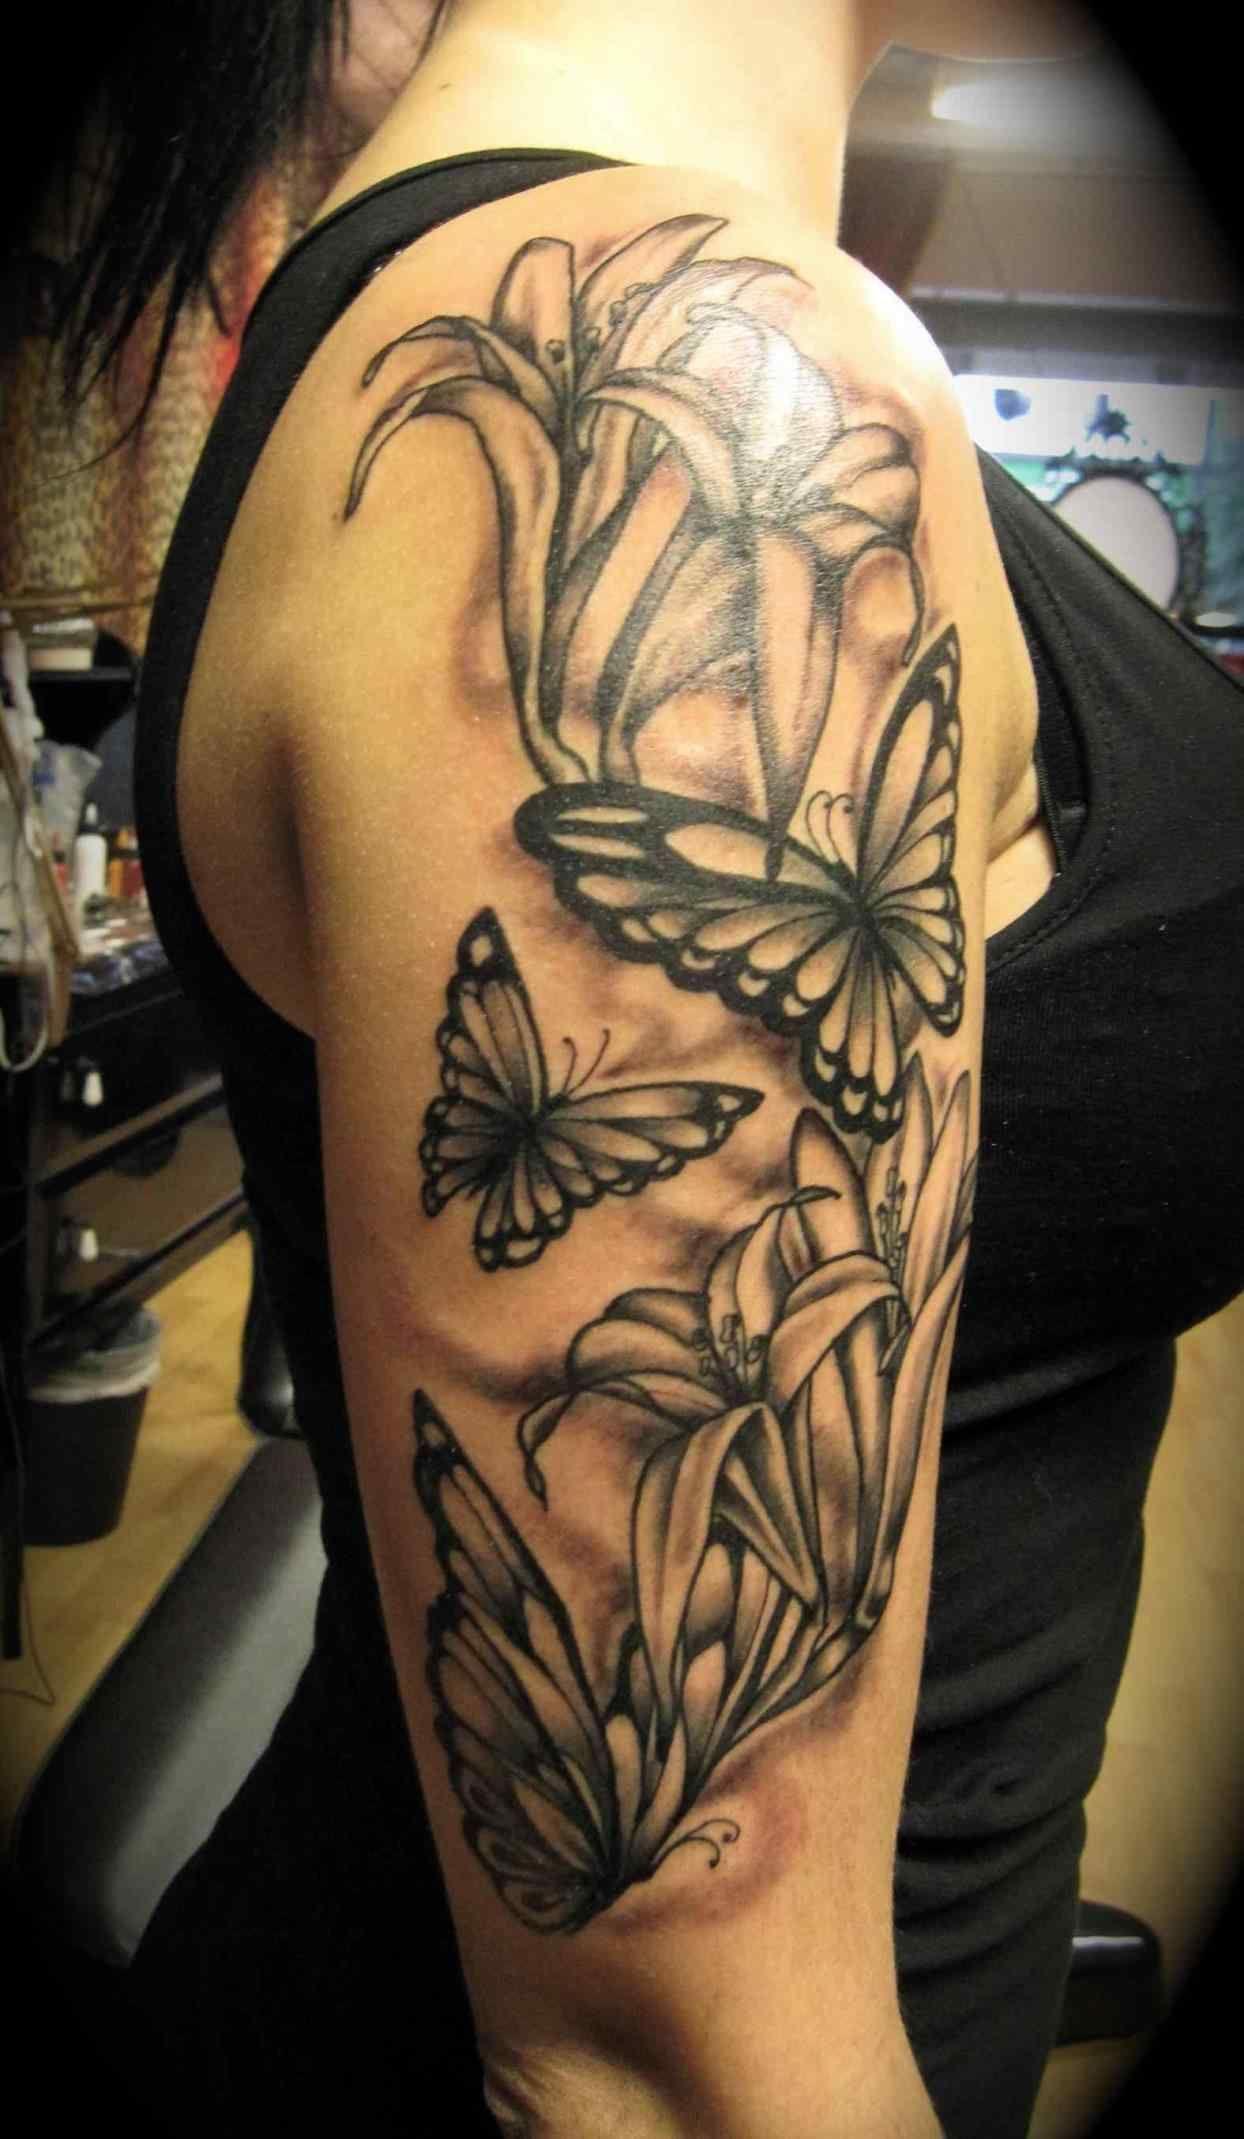 Girl Half Sleeve Tattoos Snet Rose Arm Half Sleeve Tattoo Butterfly Sleeve Tattoo Sleeve Tattoos